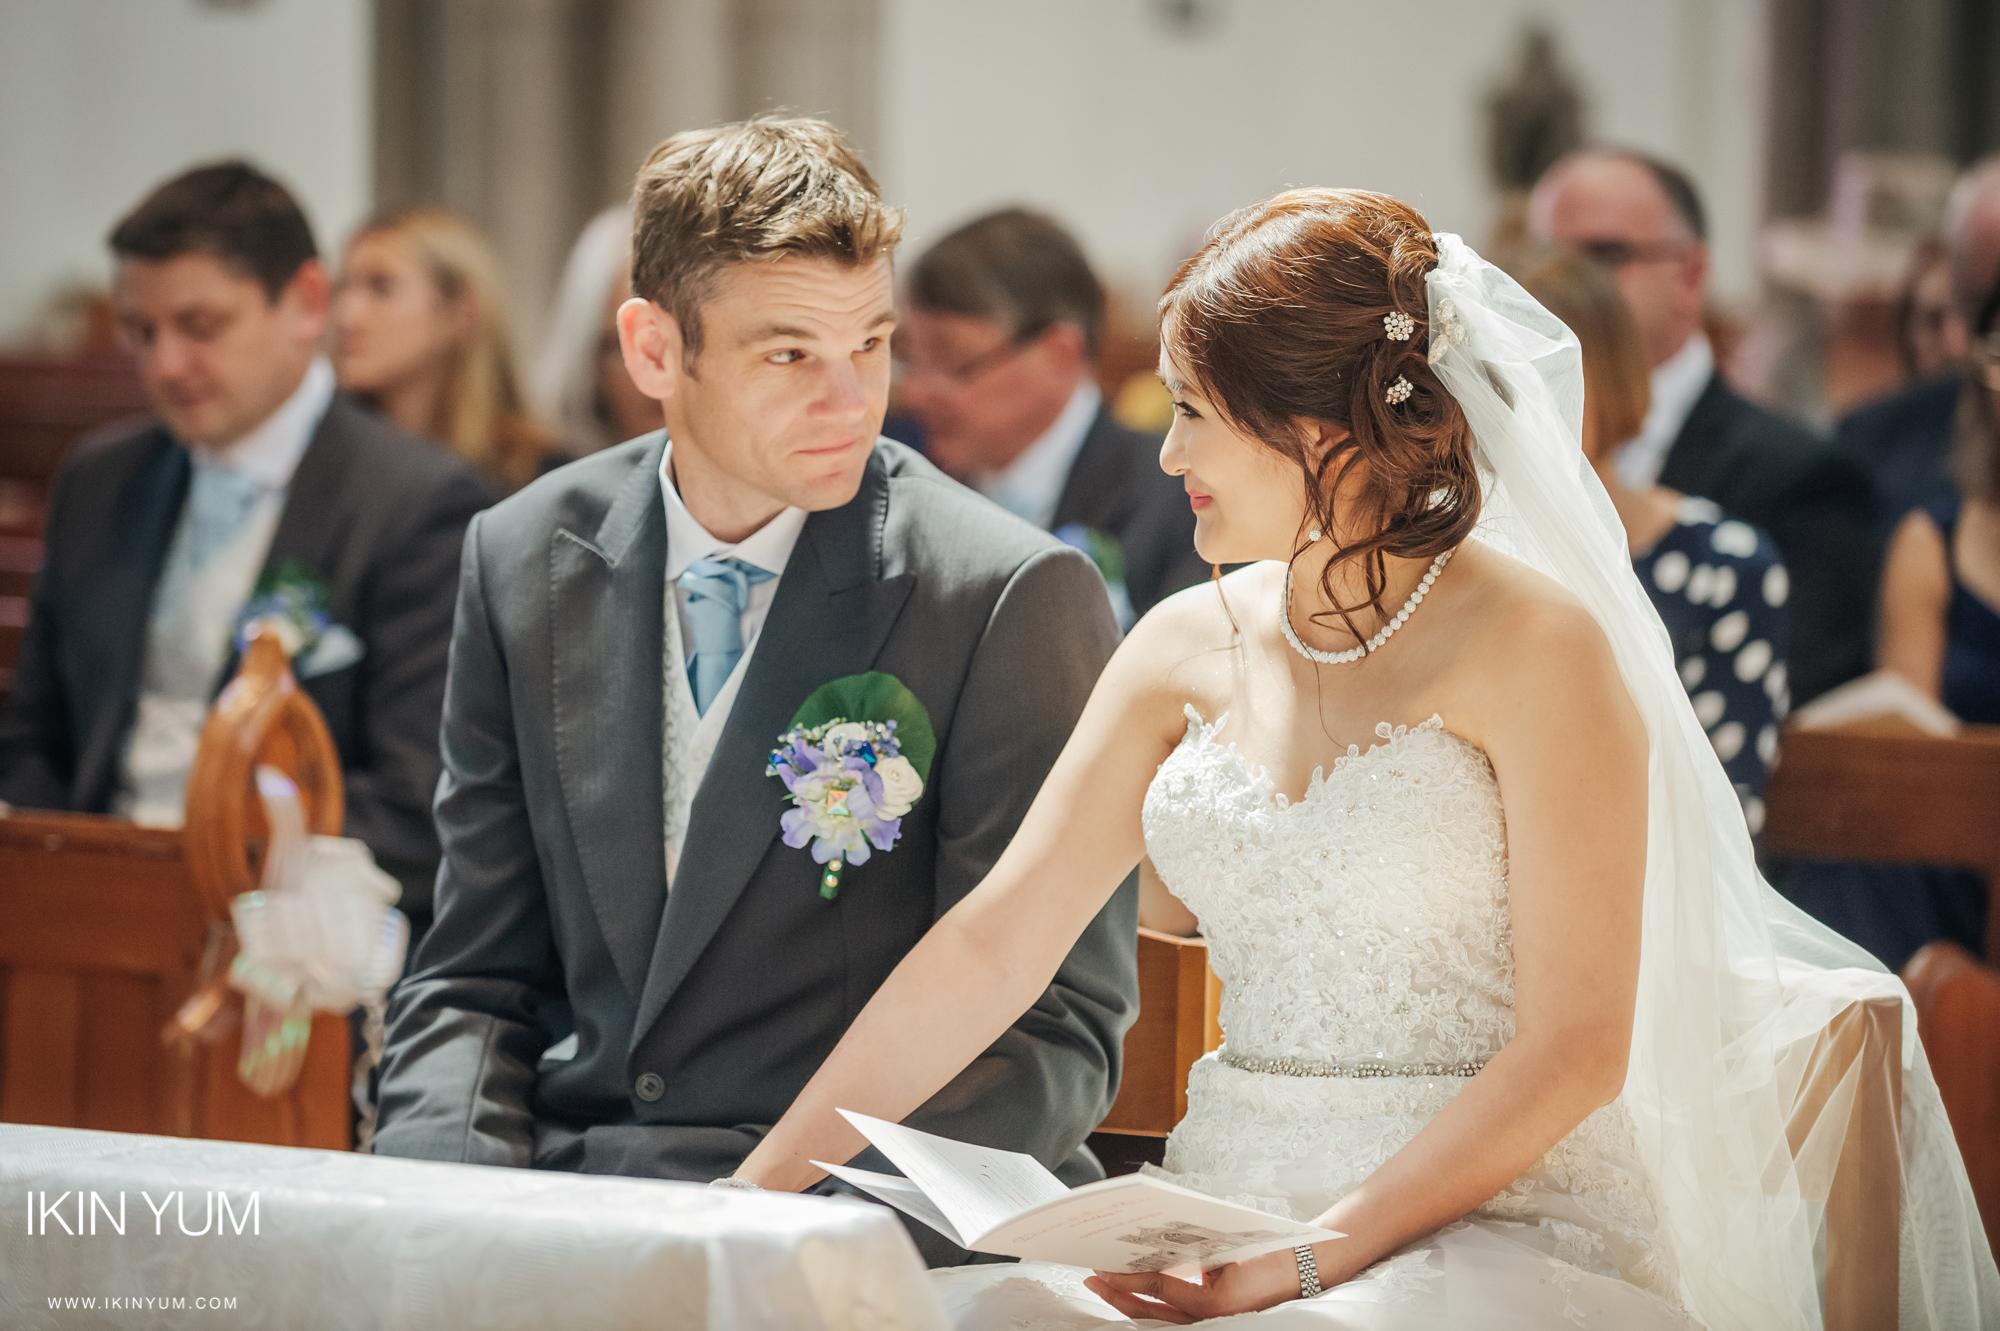 Teresa & Johnathan Weddong Day - The Ceremony-0058.jpg